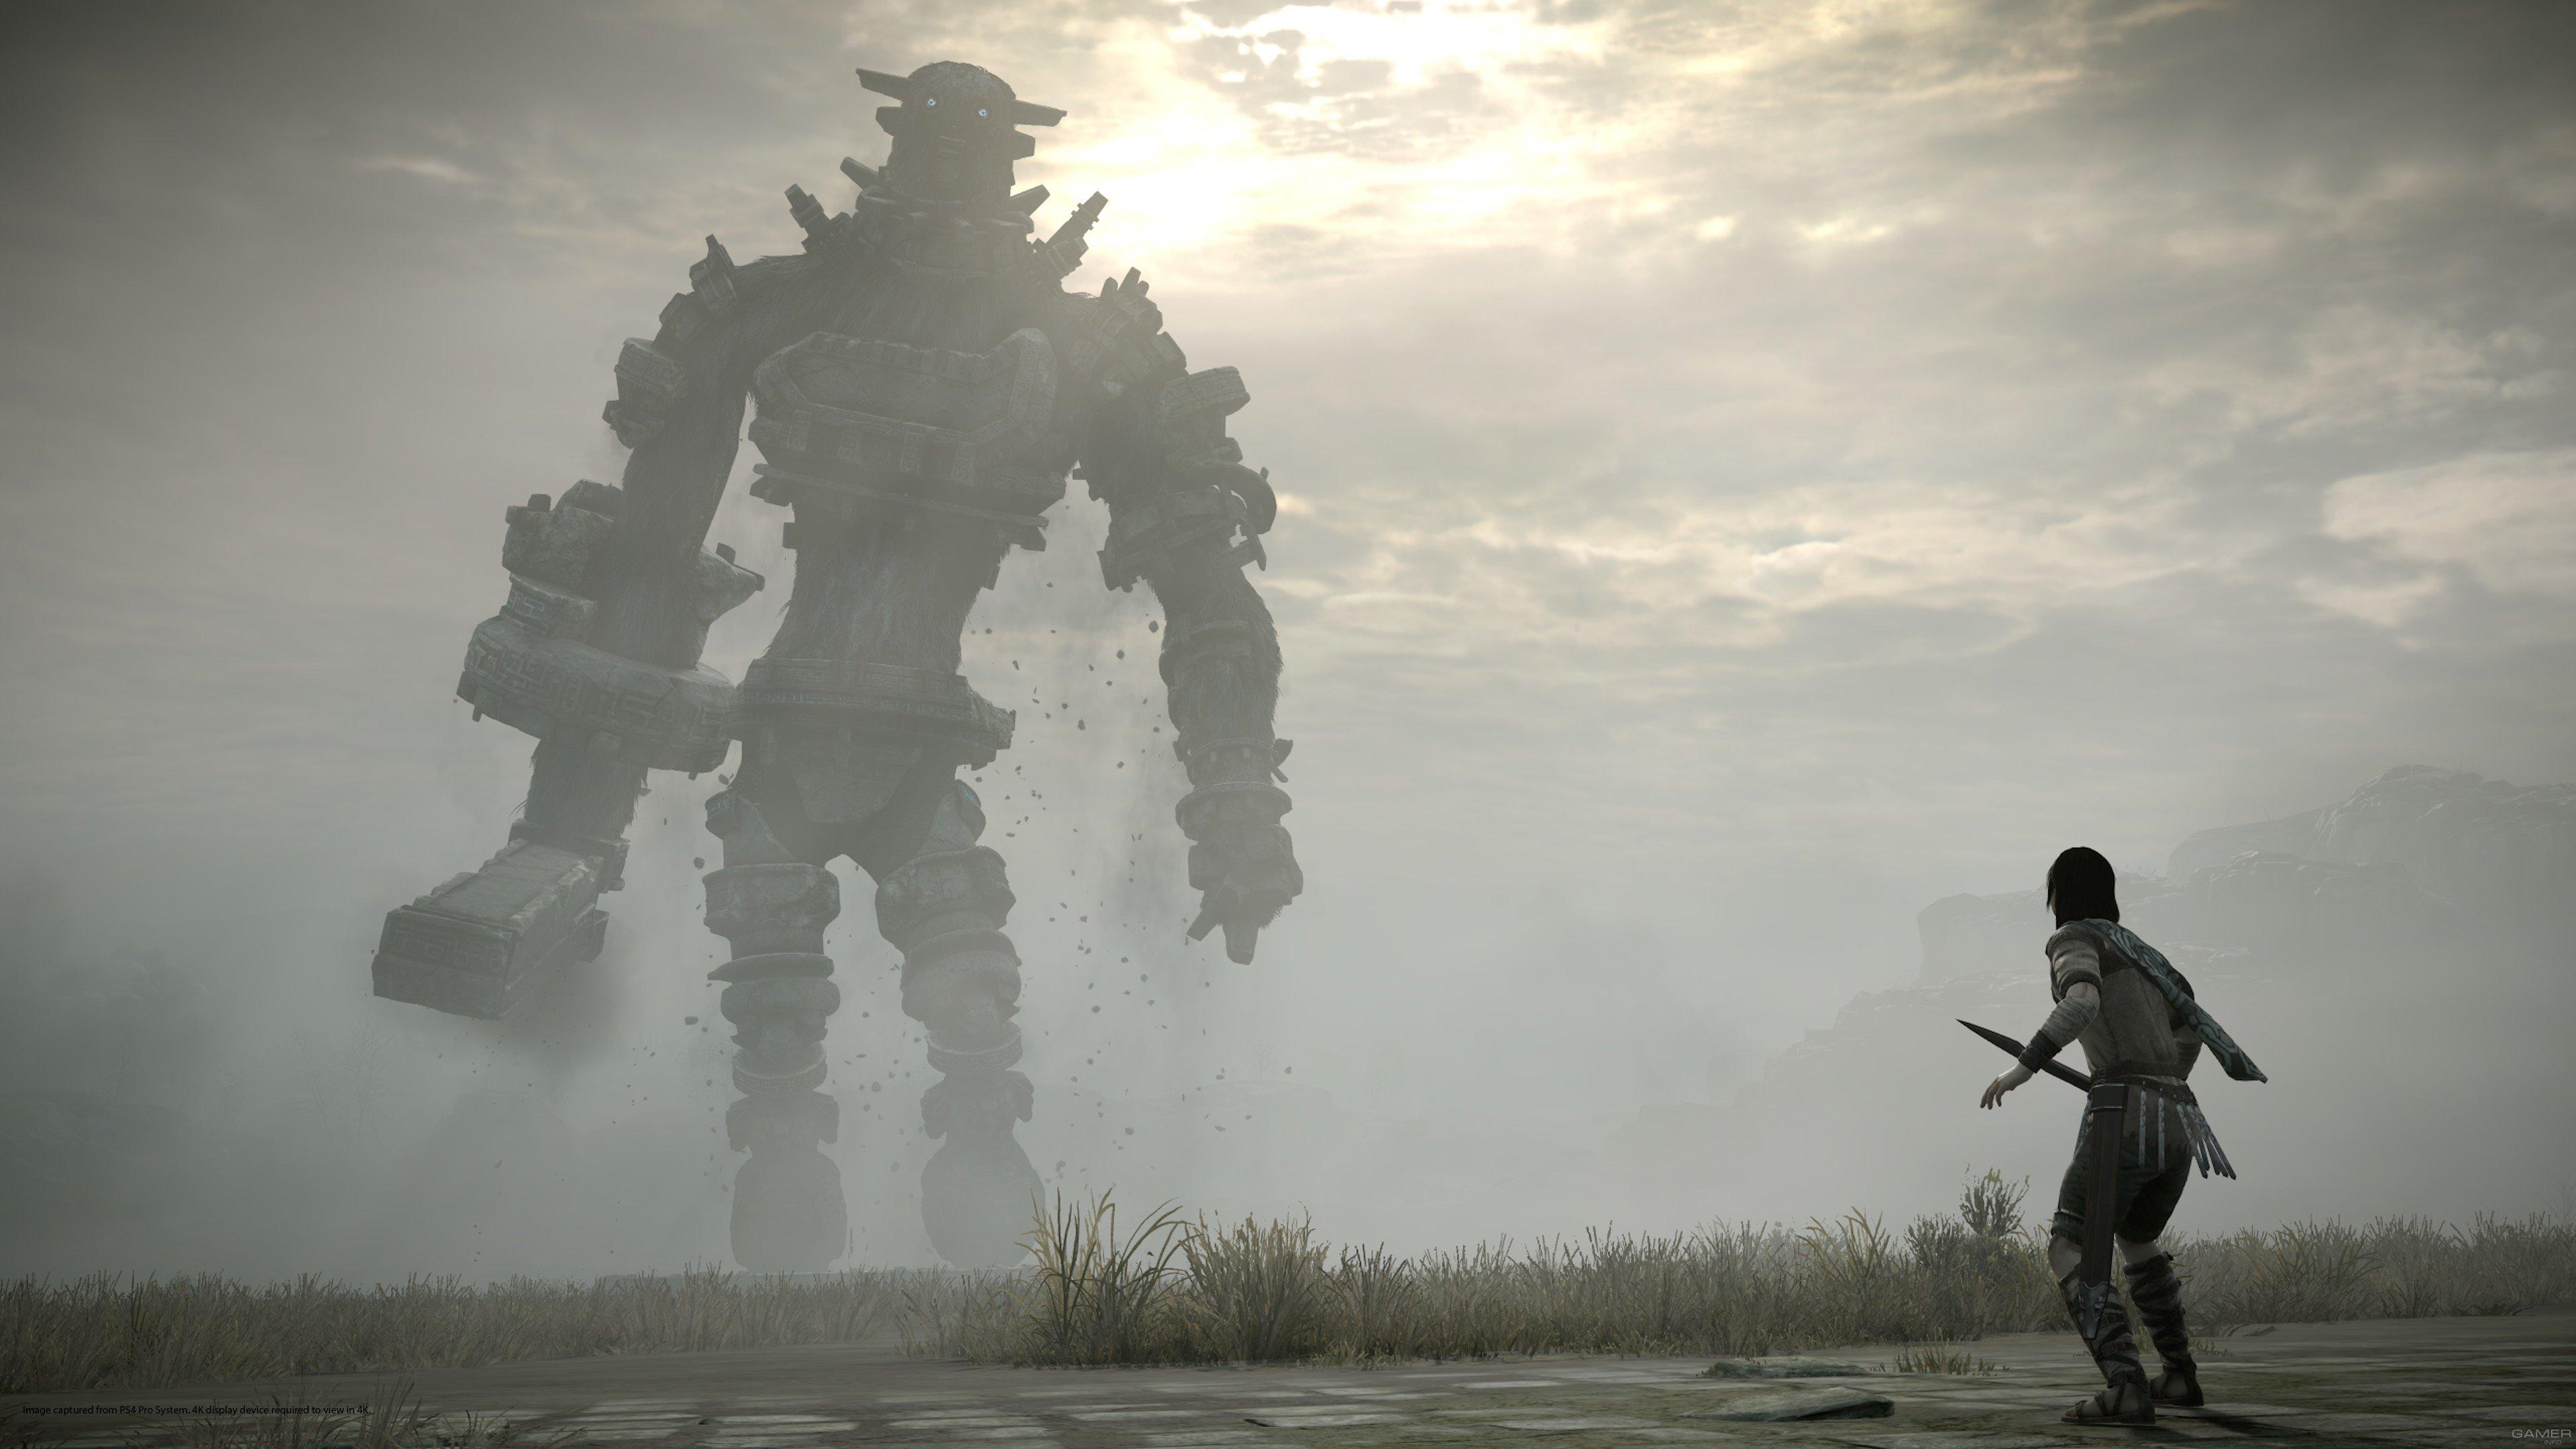 Оценки ремейка Shadow of the Colossus